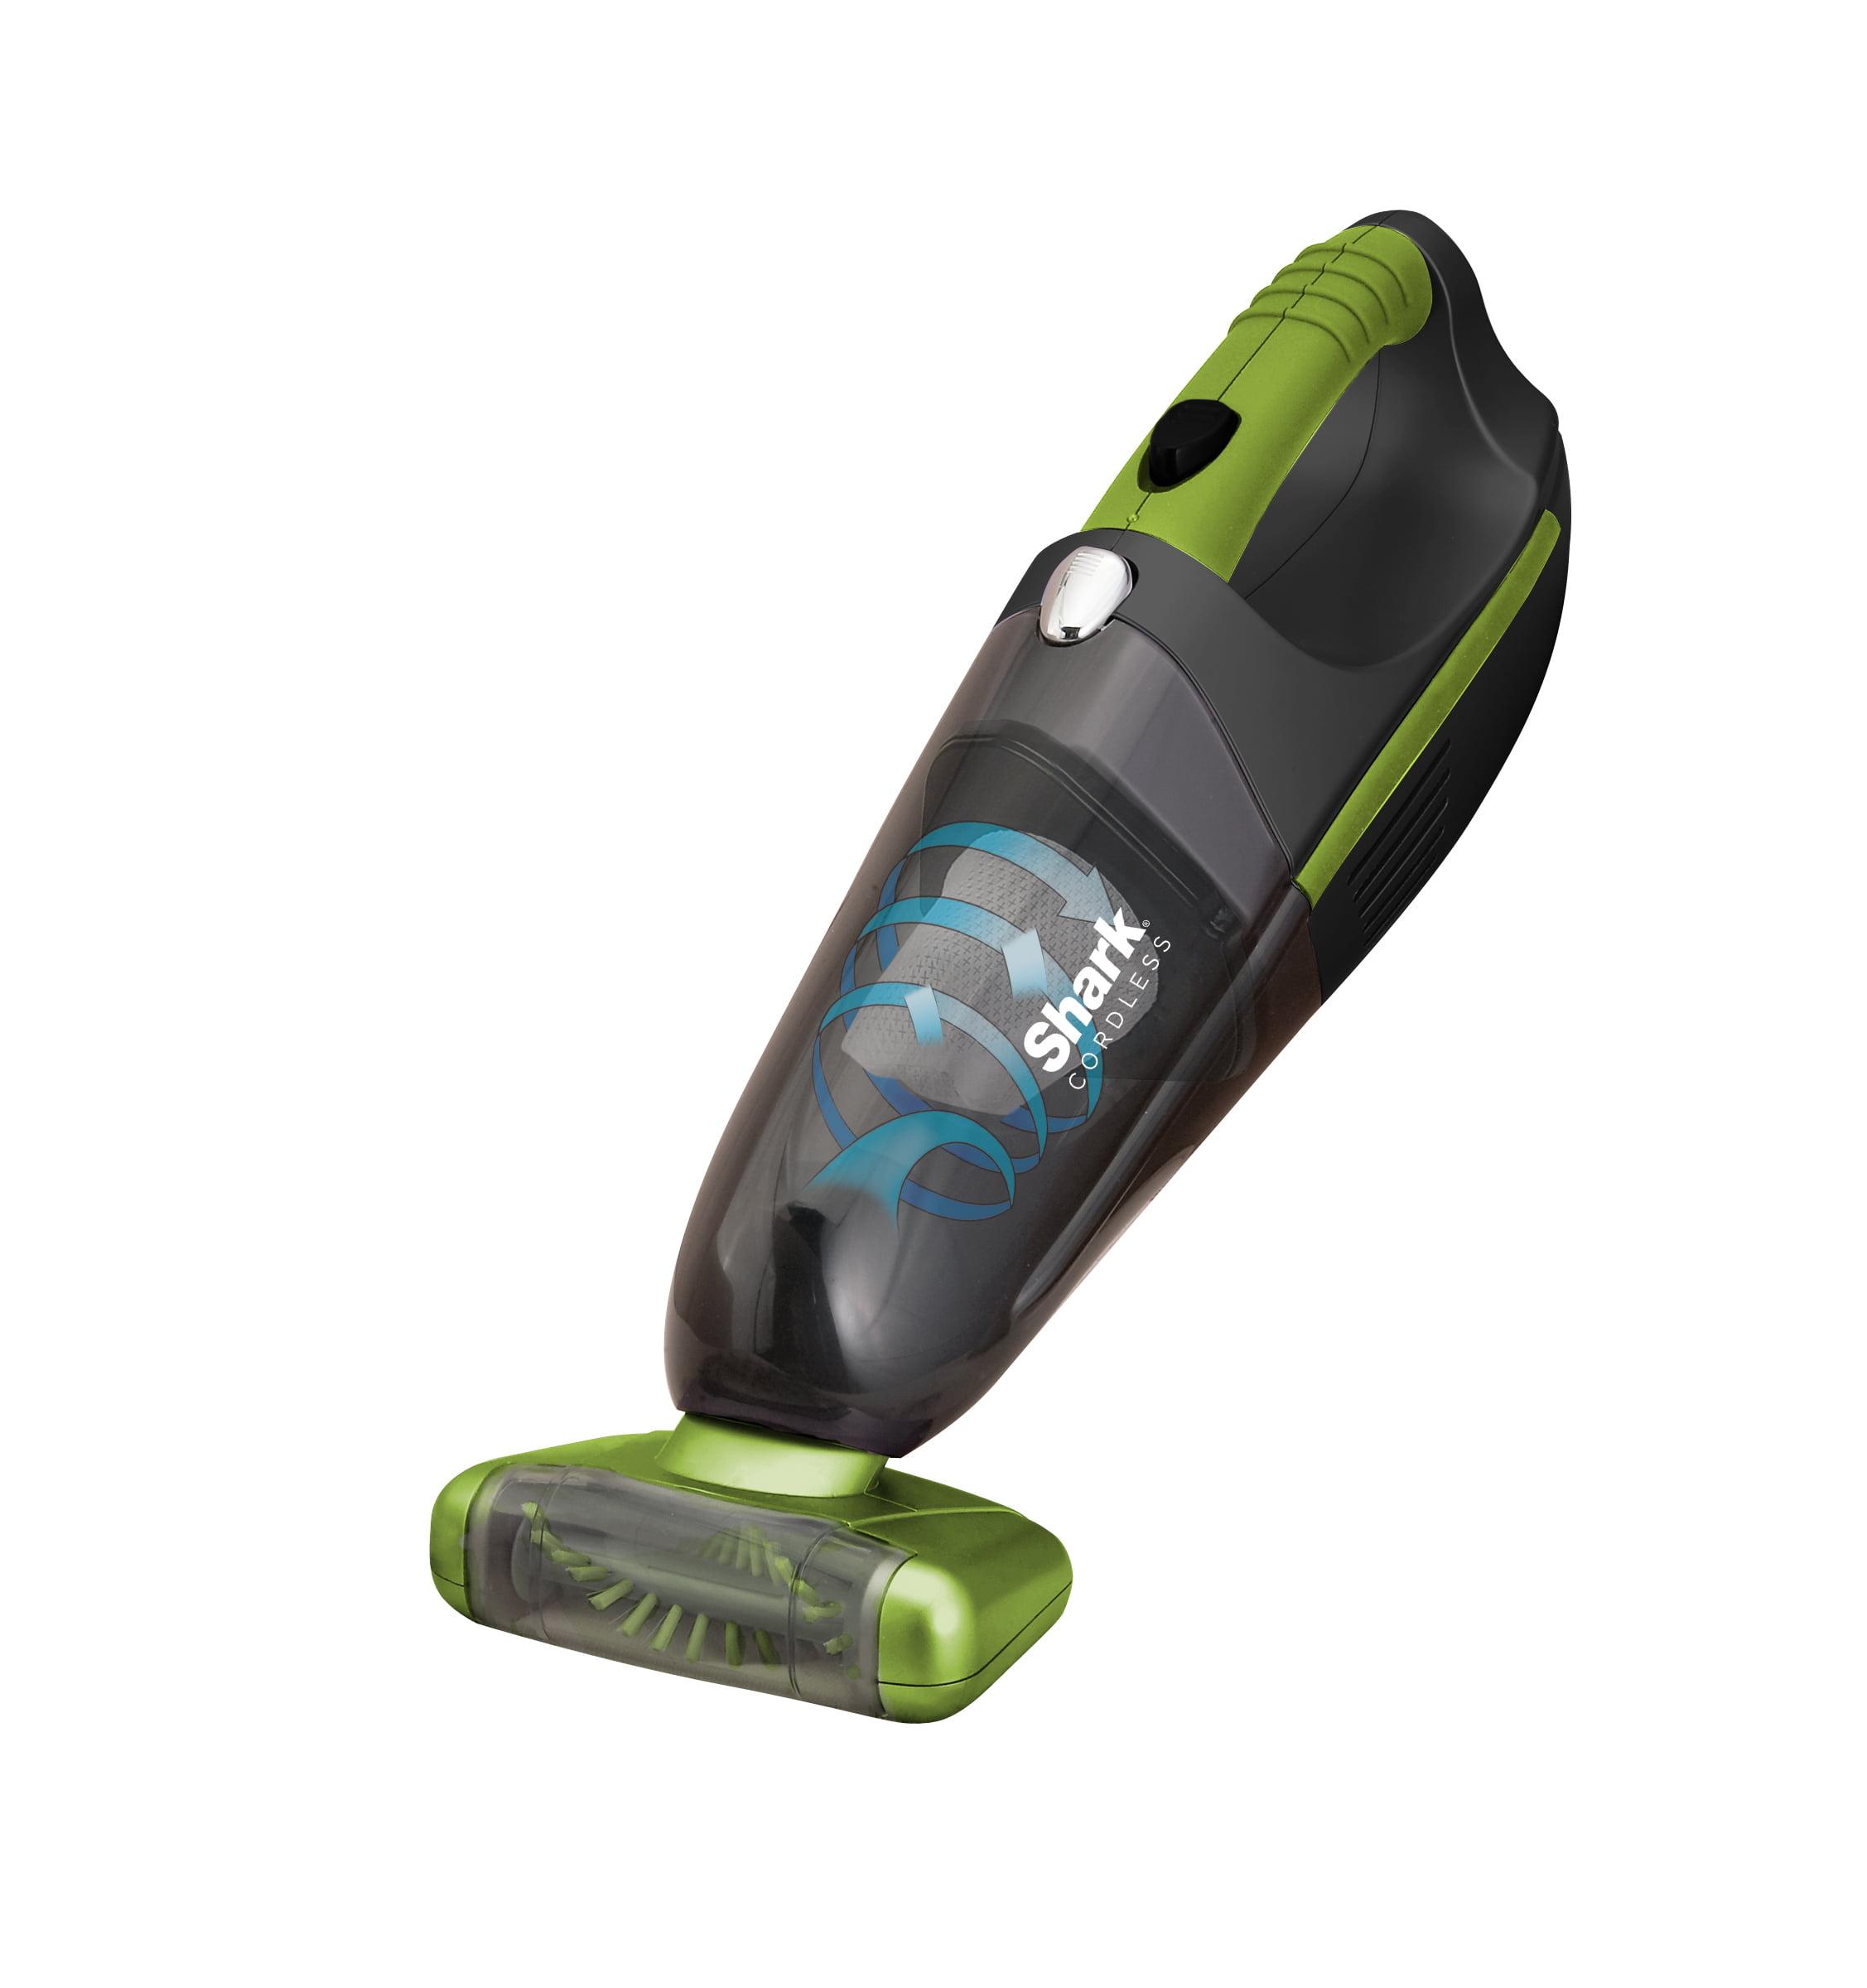 Shark cordless pet perfect hand vac ebay for Shark cordless vacuum